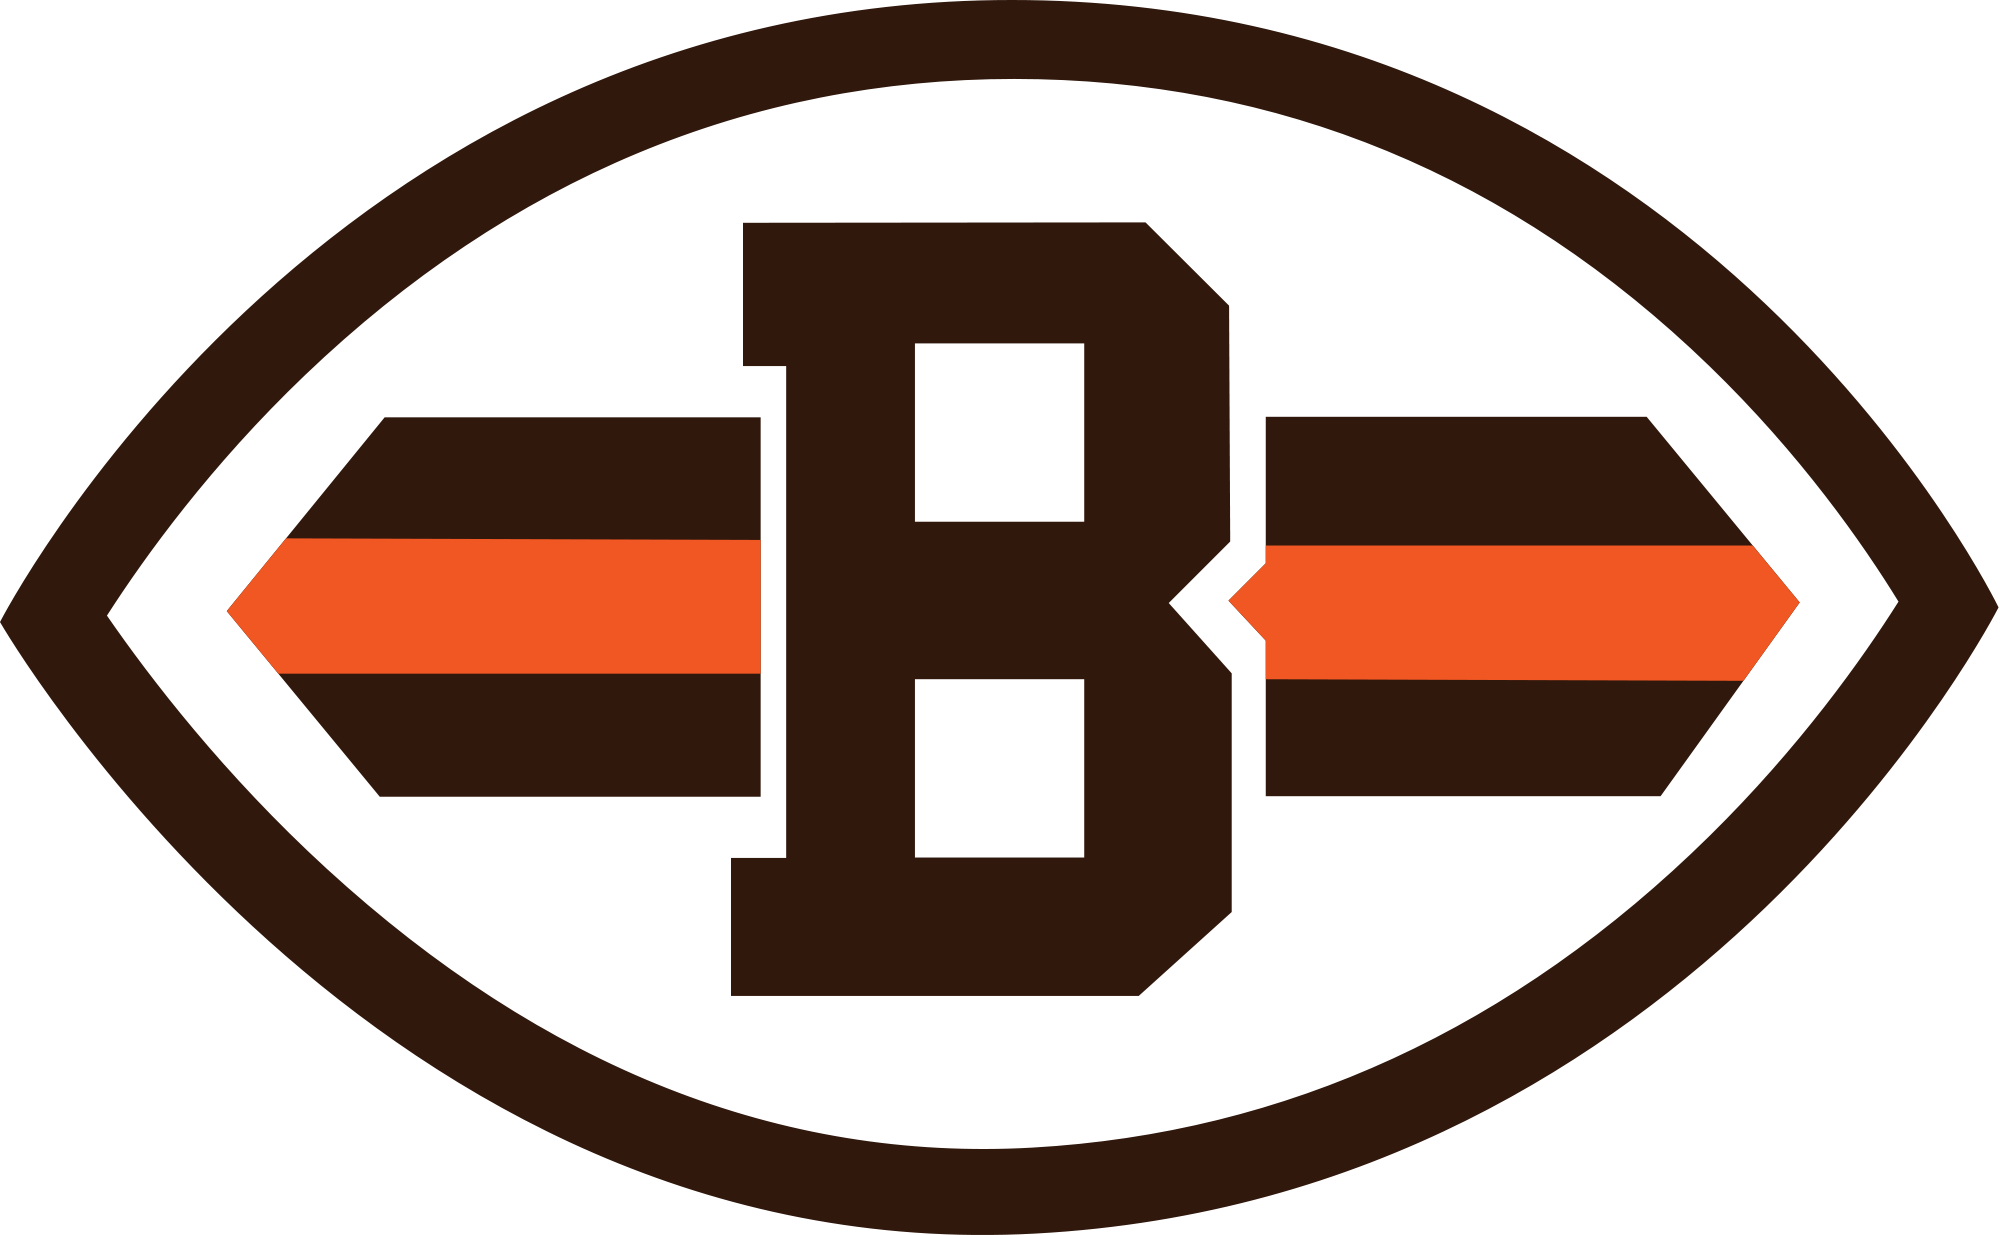 Cleveland Browns Logo PNG - 99133